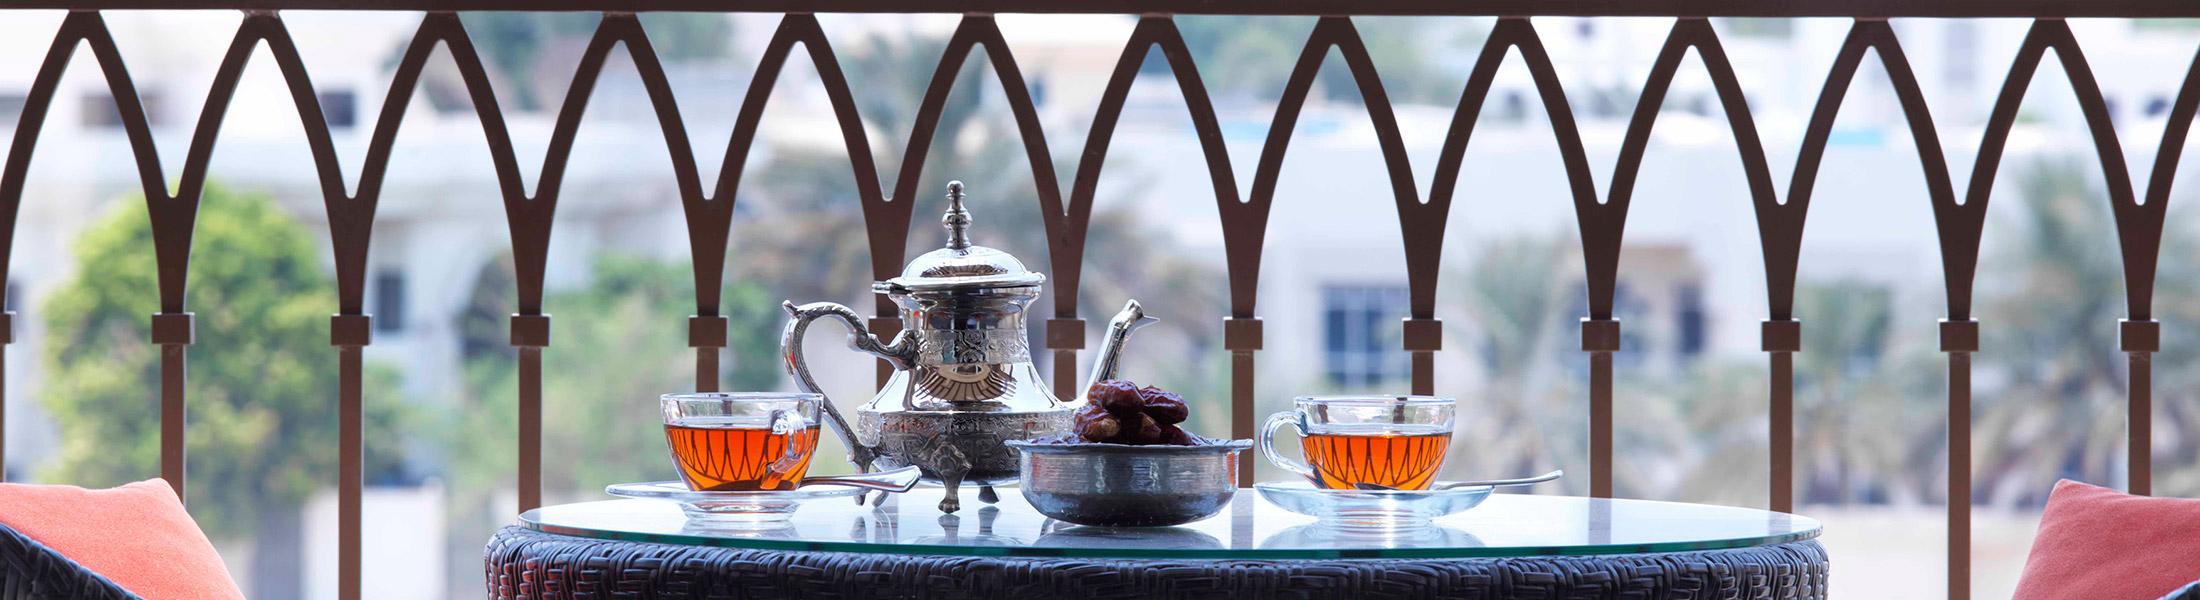 Arabian tea on teh balcony at Anantara Eastern Mangroves